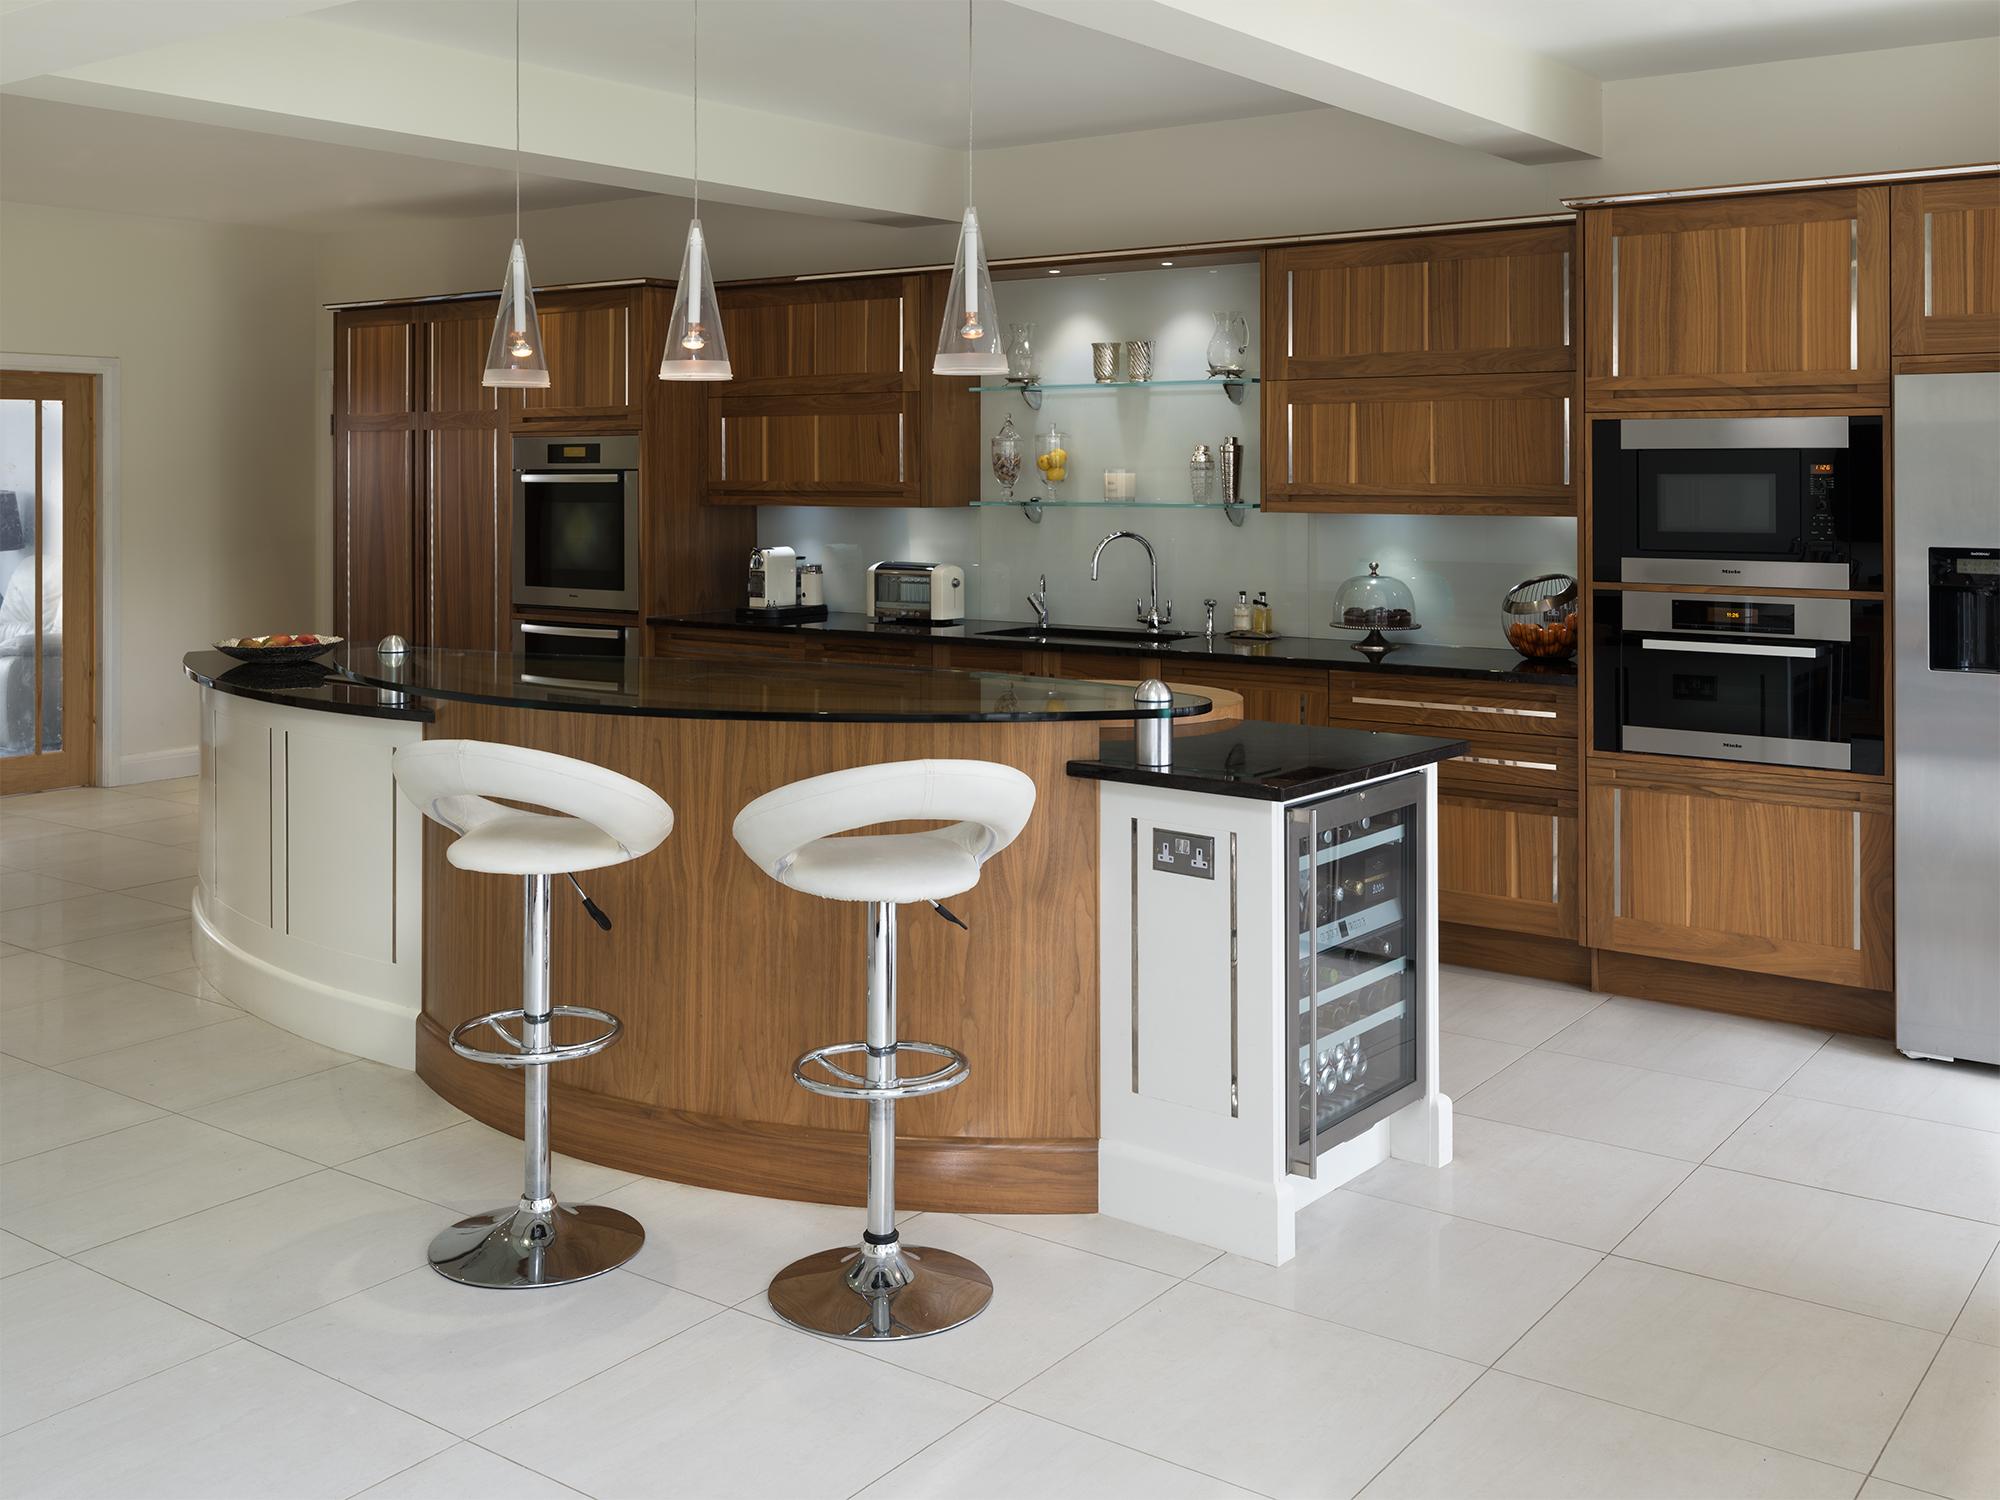 Mark wilkinson furniture collection newlyn kitchen 10